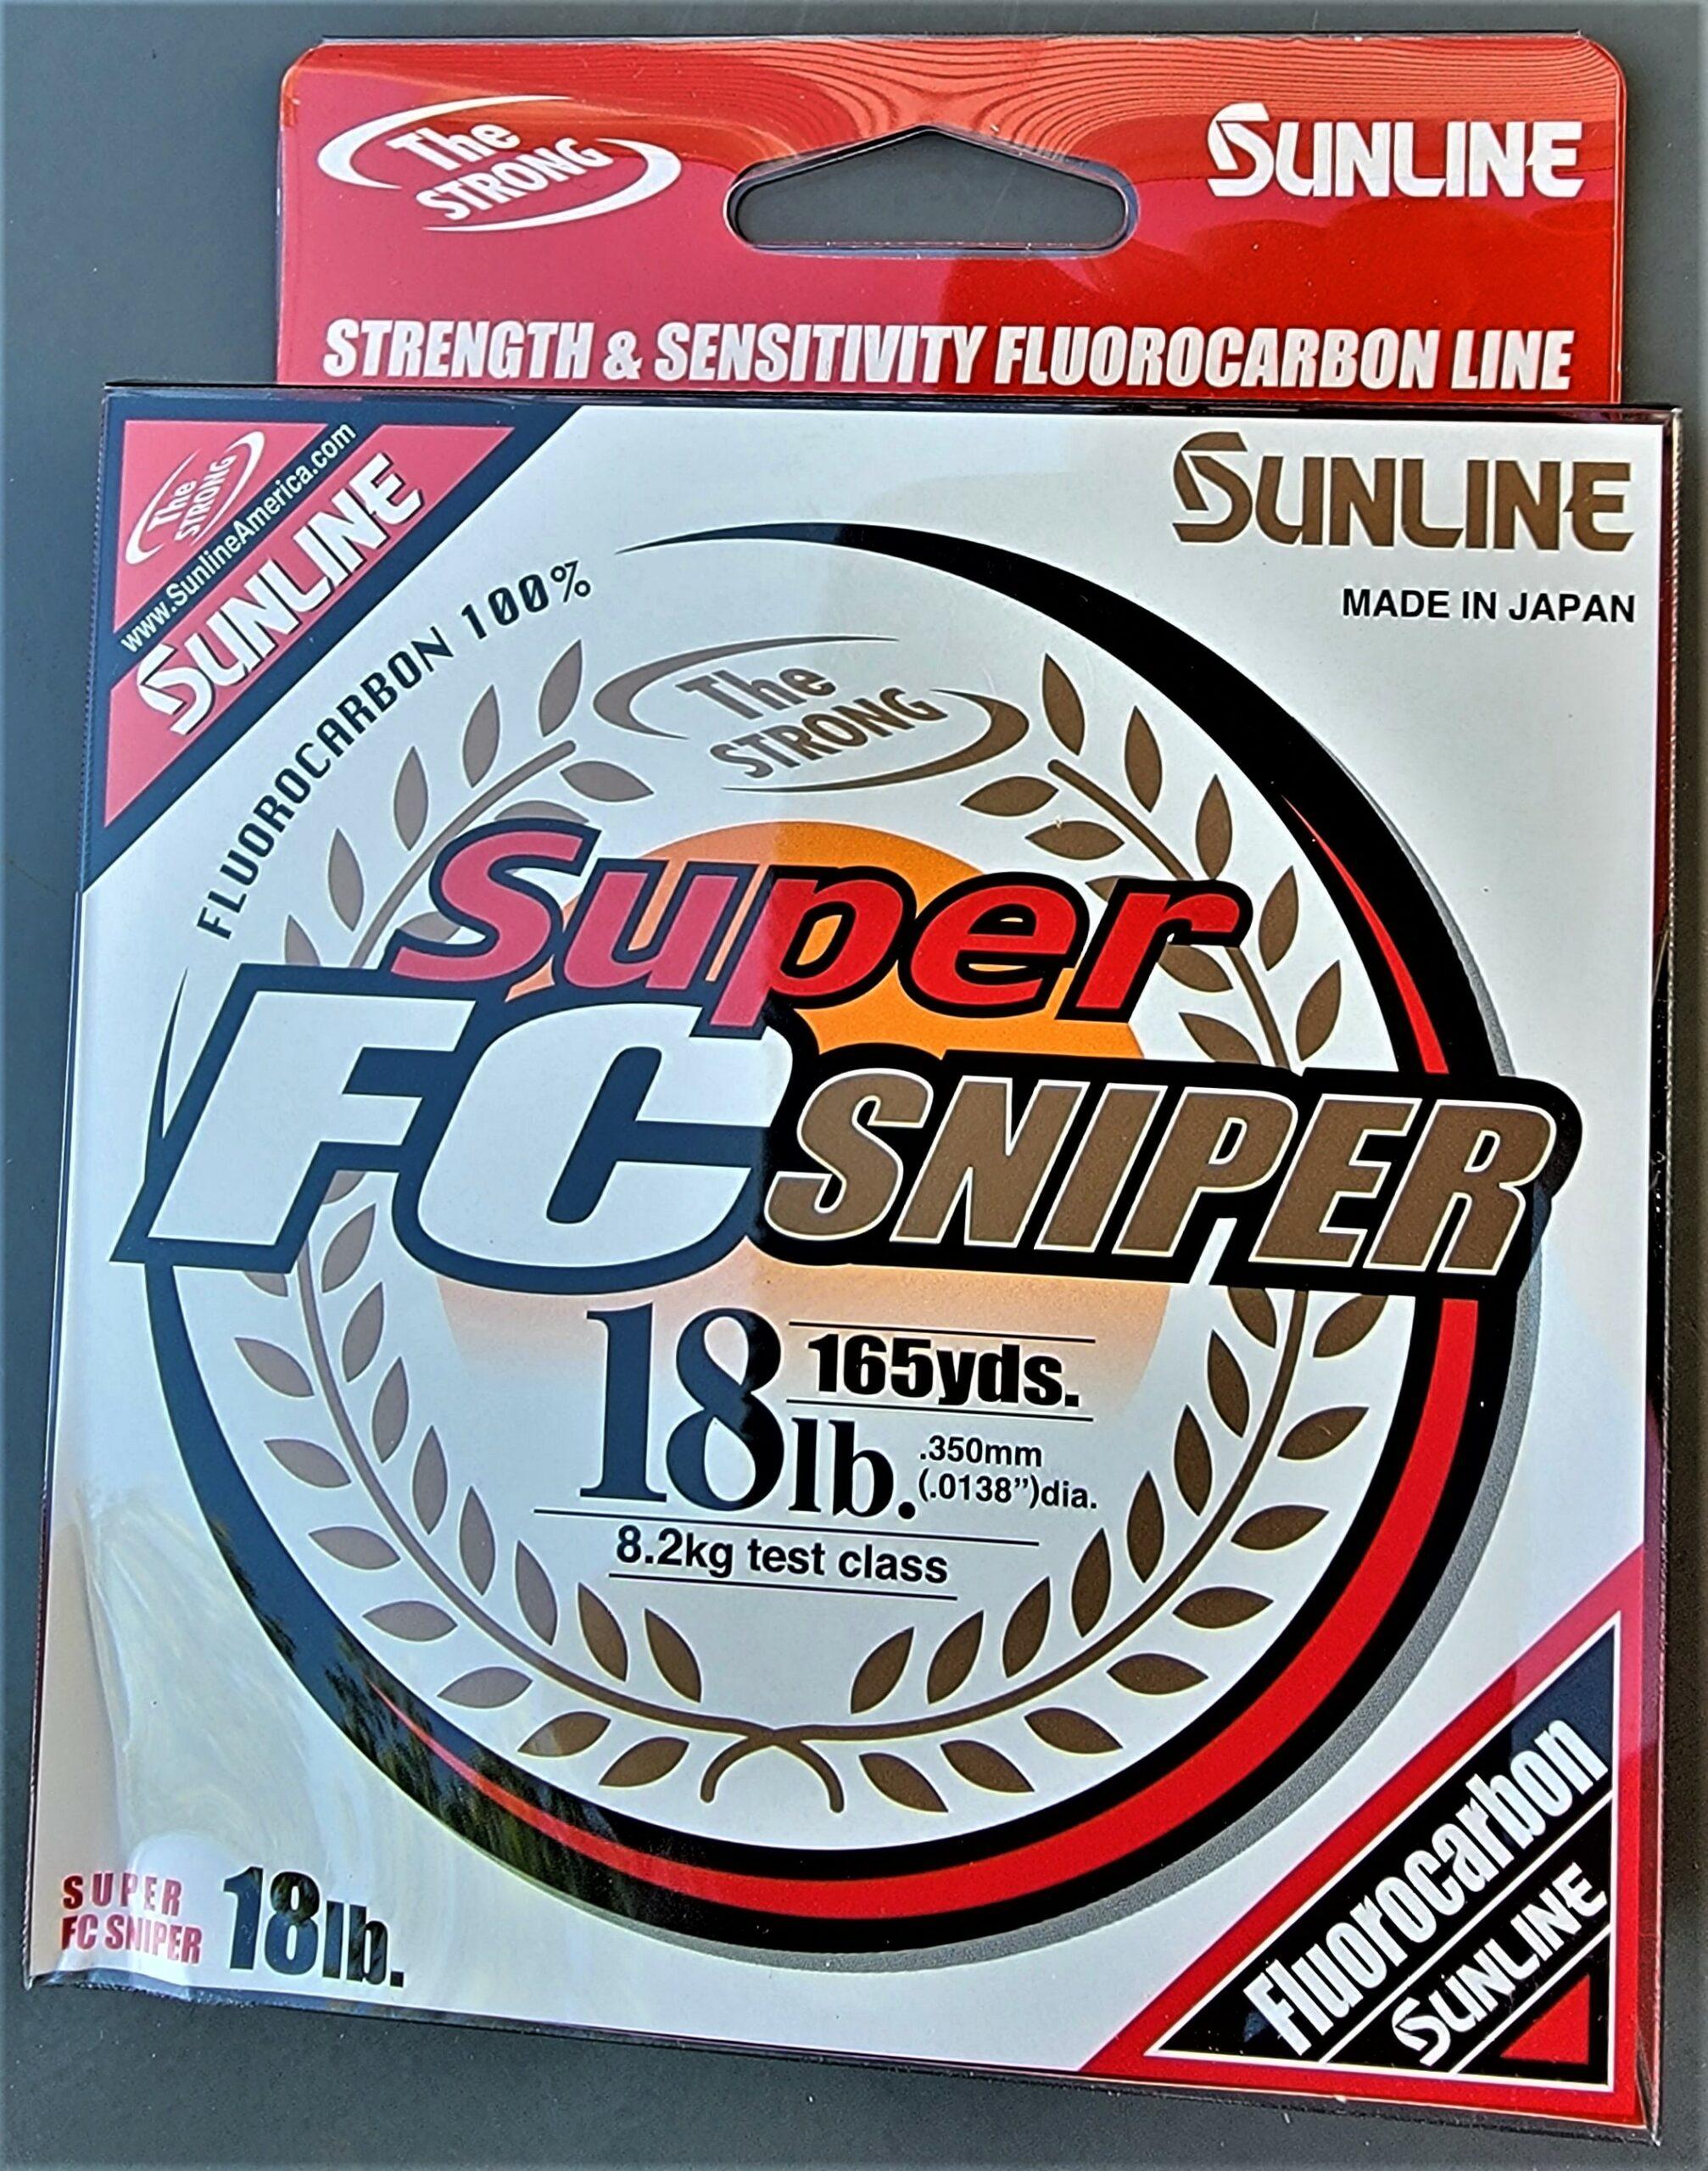 Sunline - Super FC Sniper - 165 YD - Super FC Sniper - 18 LB - Natural Clear